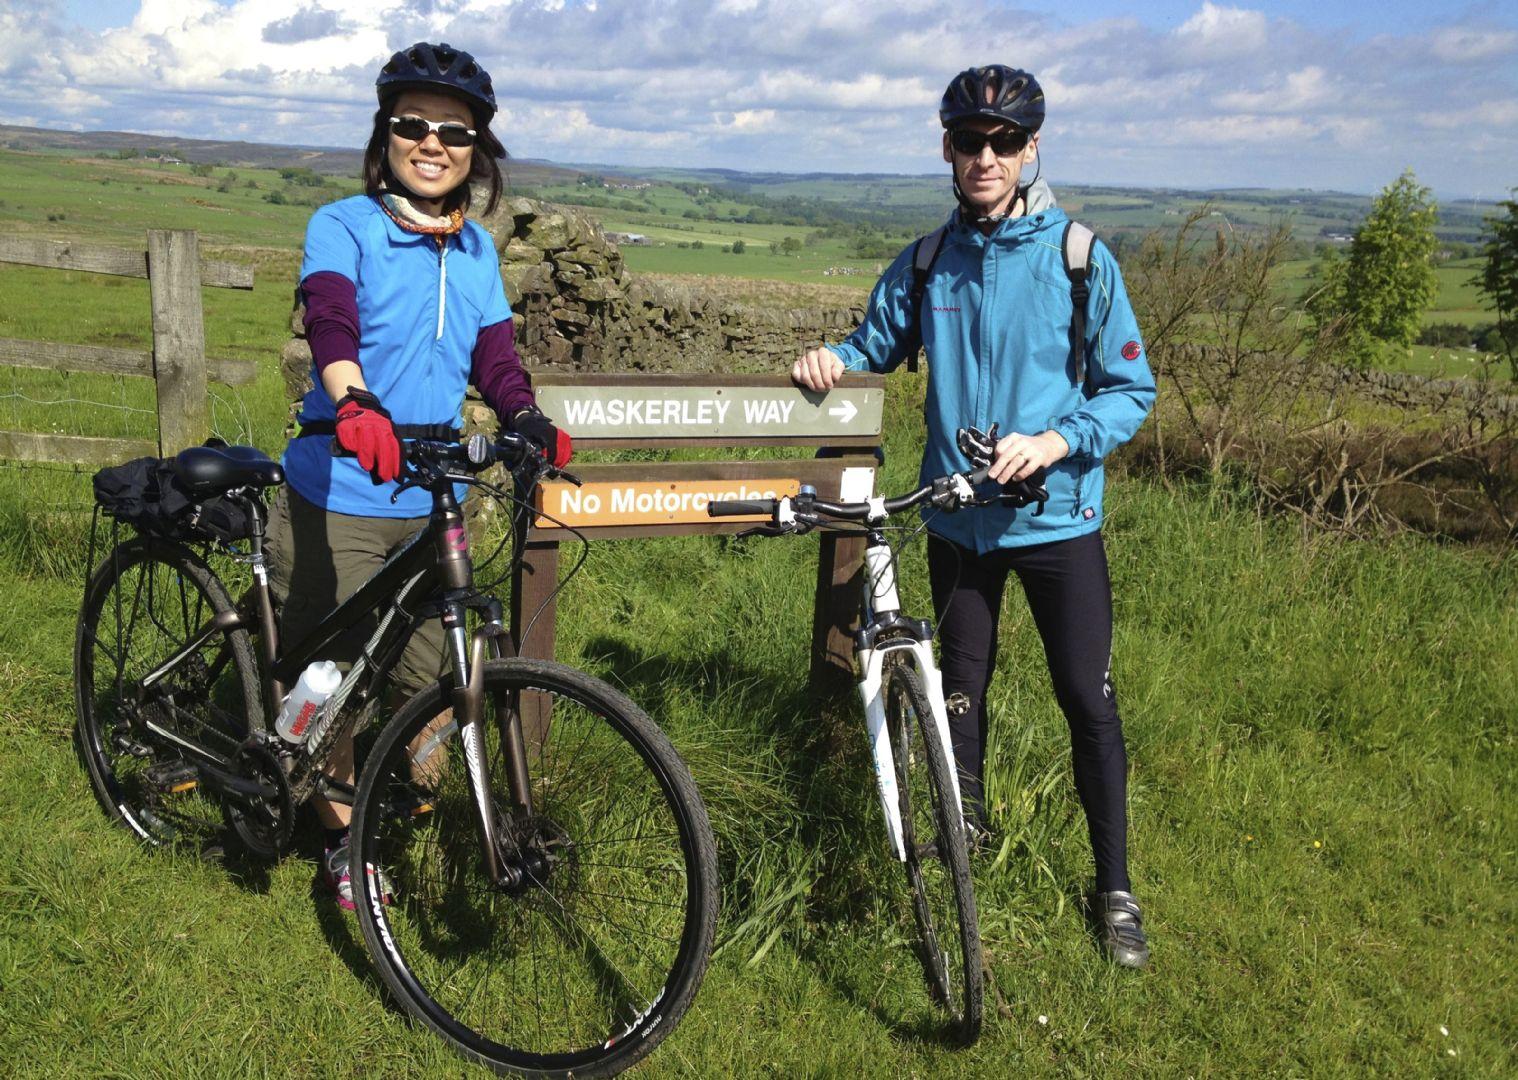 _Customer.103238.16258.jpg - UK - C2C - Coast to Coast 5 Days Cycling - Self-Guided Leisure Cycling Holiday - Leisure Cycling